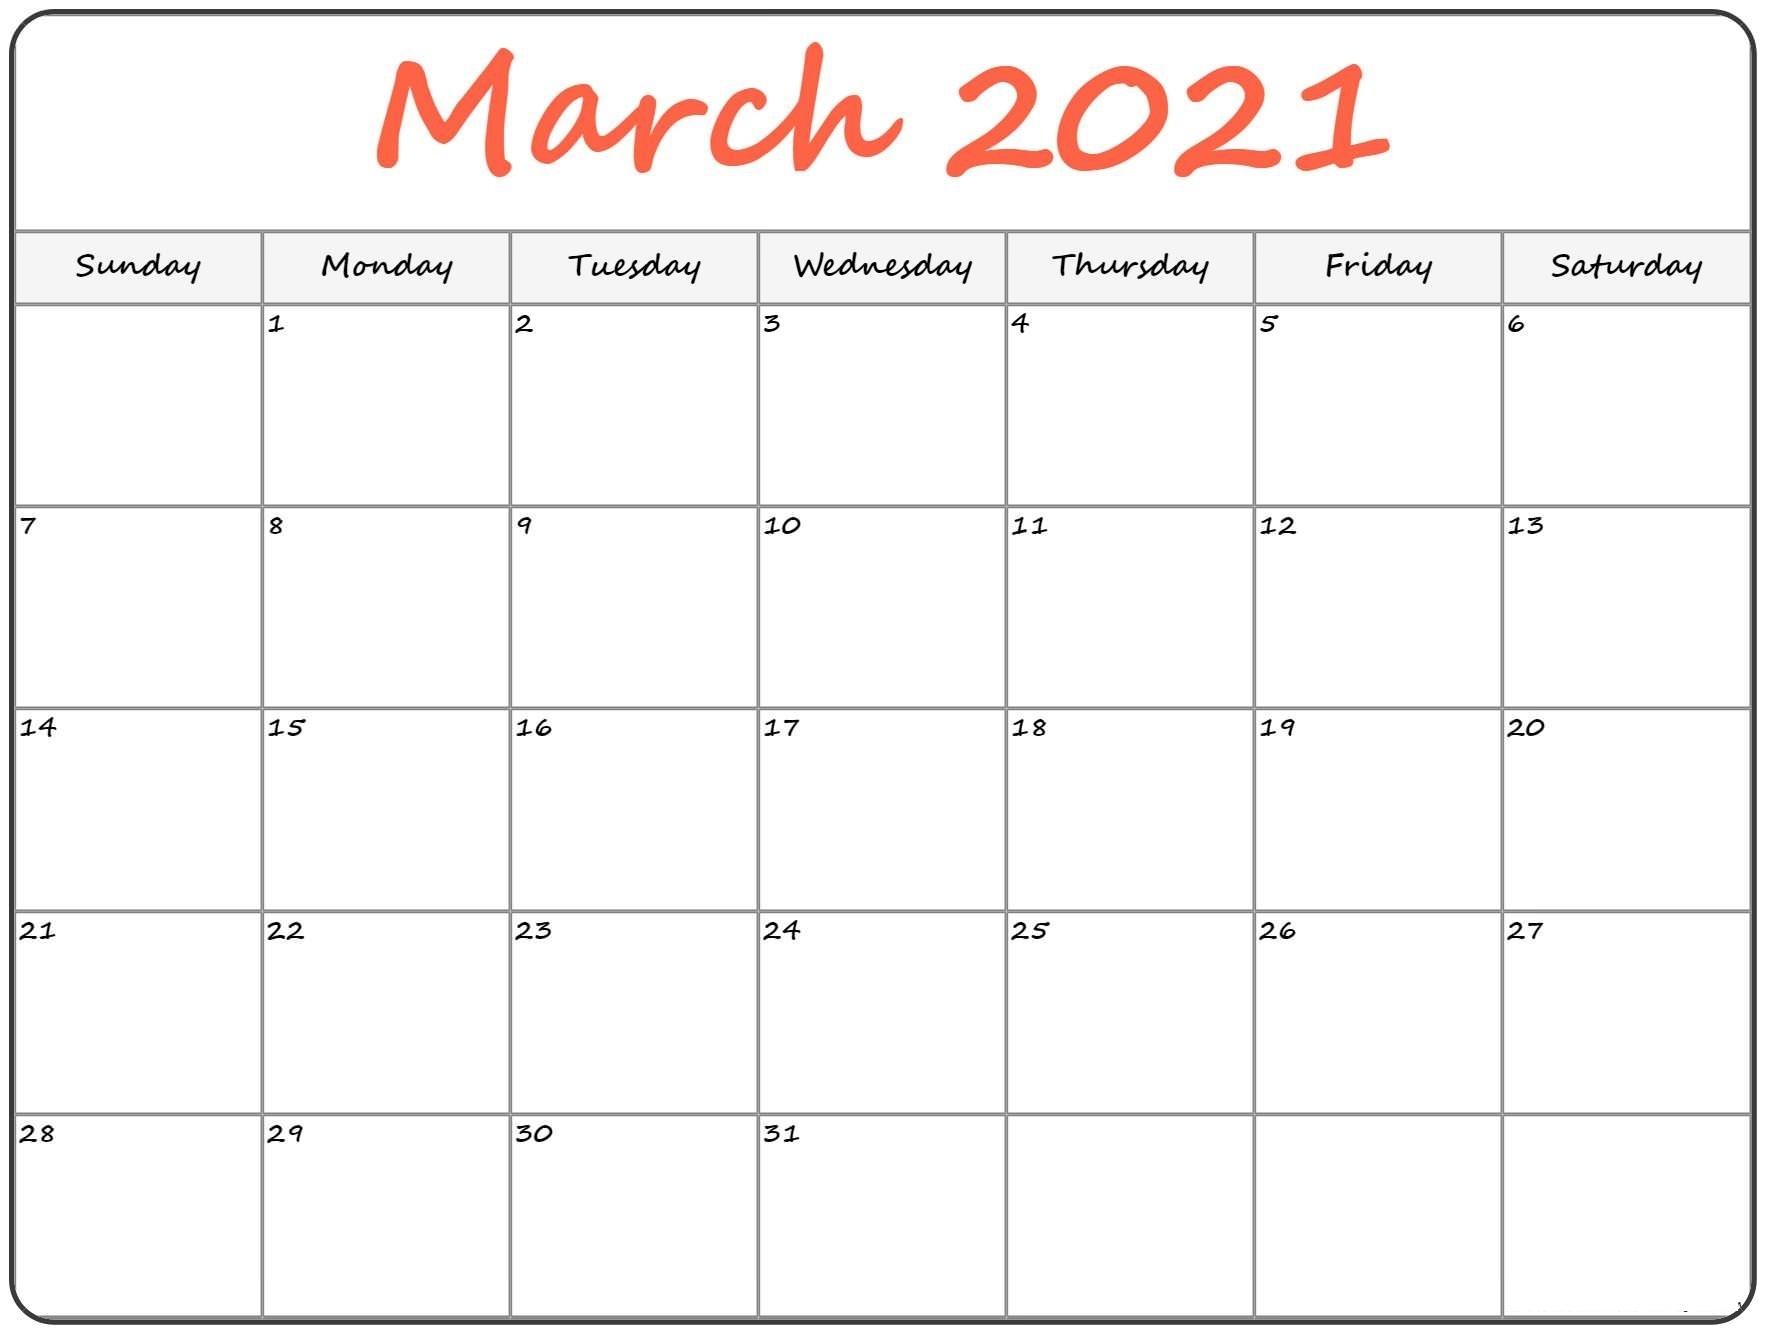 March 2021 Printable Calendar Notes Templates - One